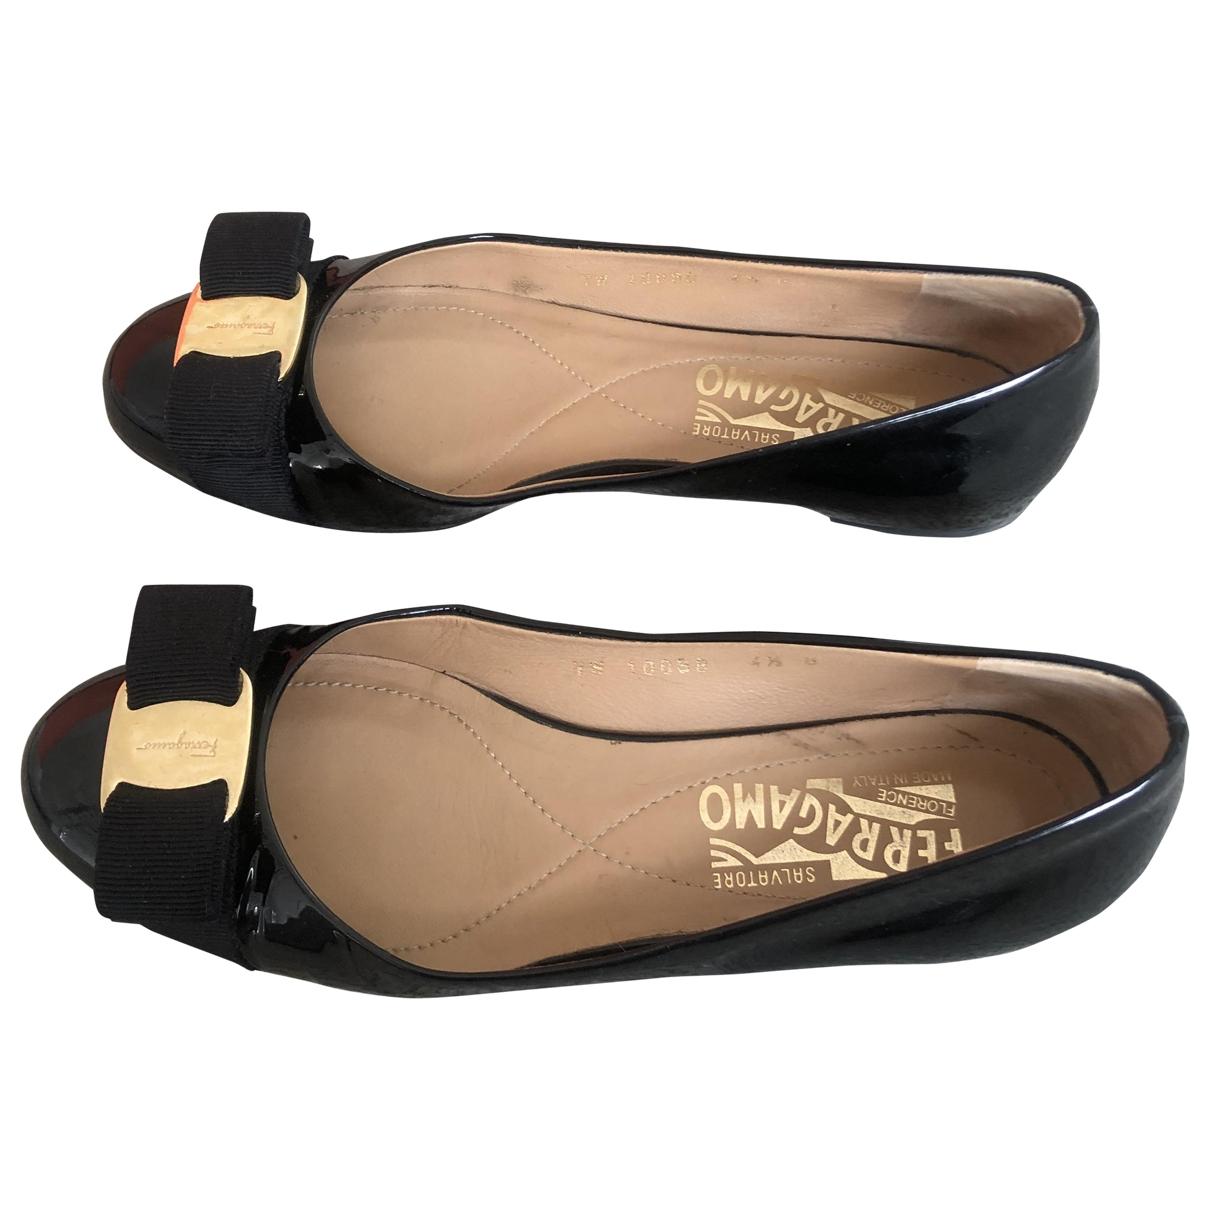 Salvatore Ferragamo \N Black Patent leather Ballet flats for Women 34.5 EU